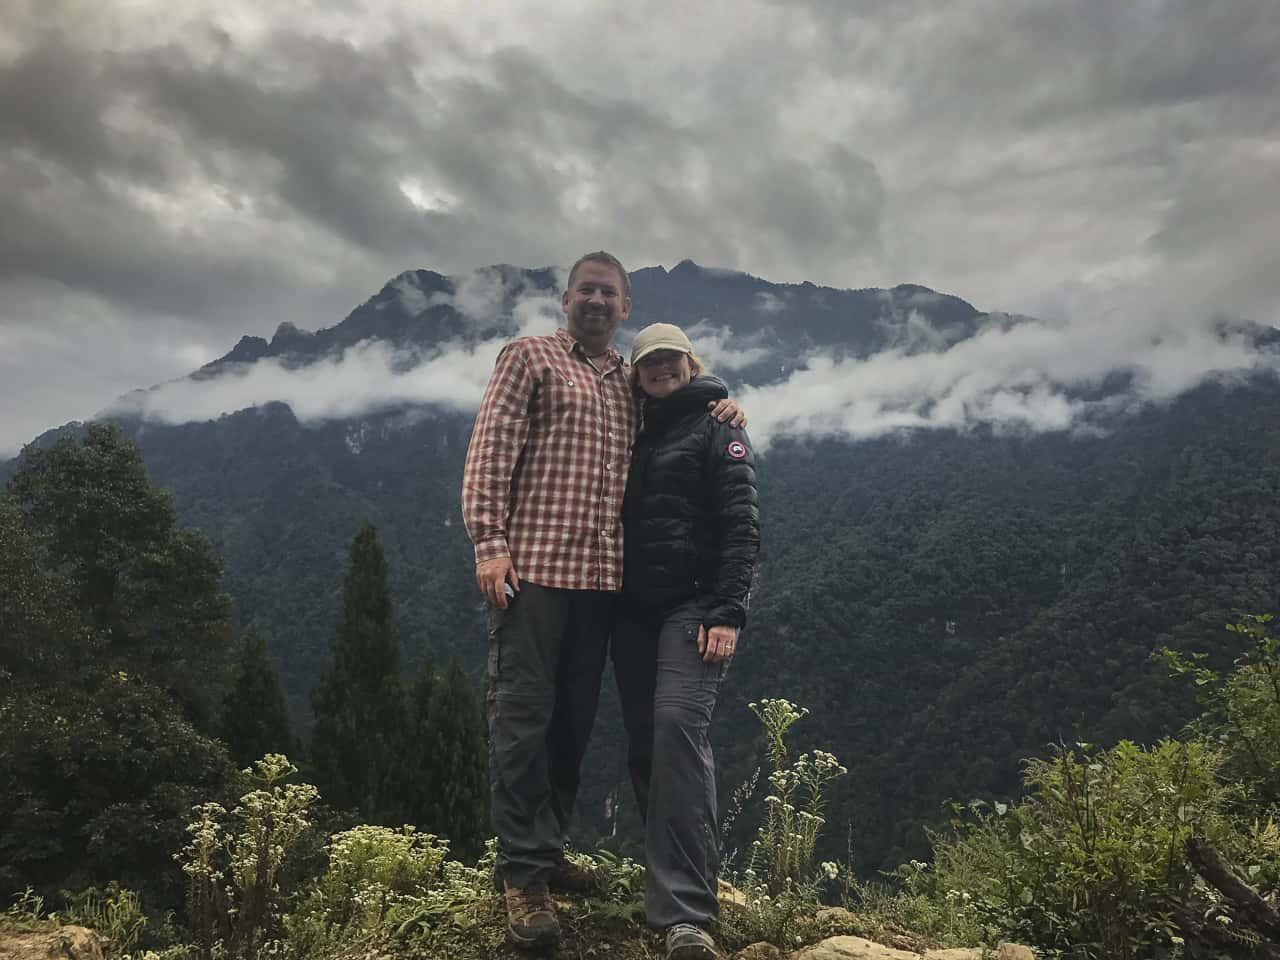 bhutan trek trail